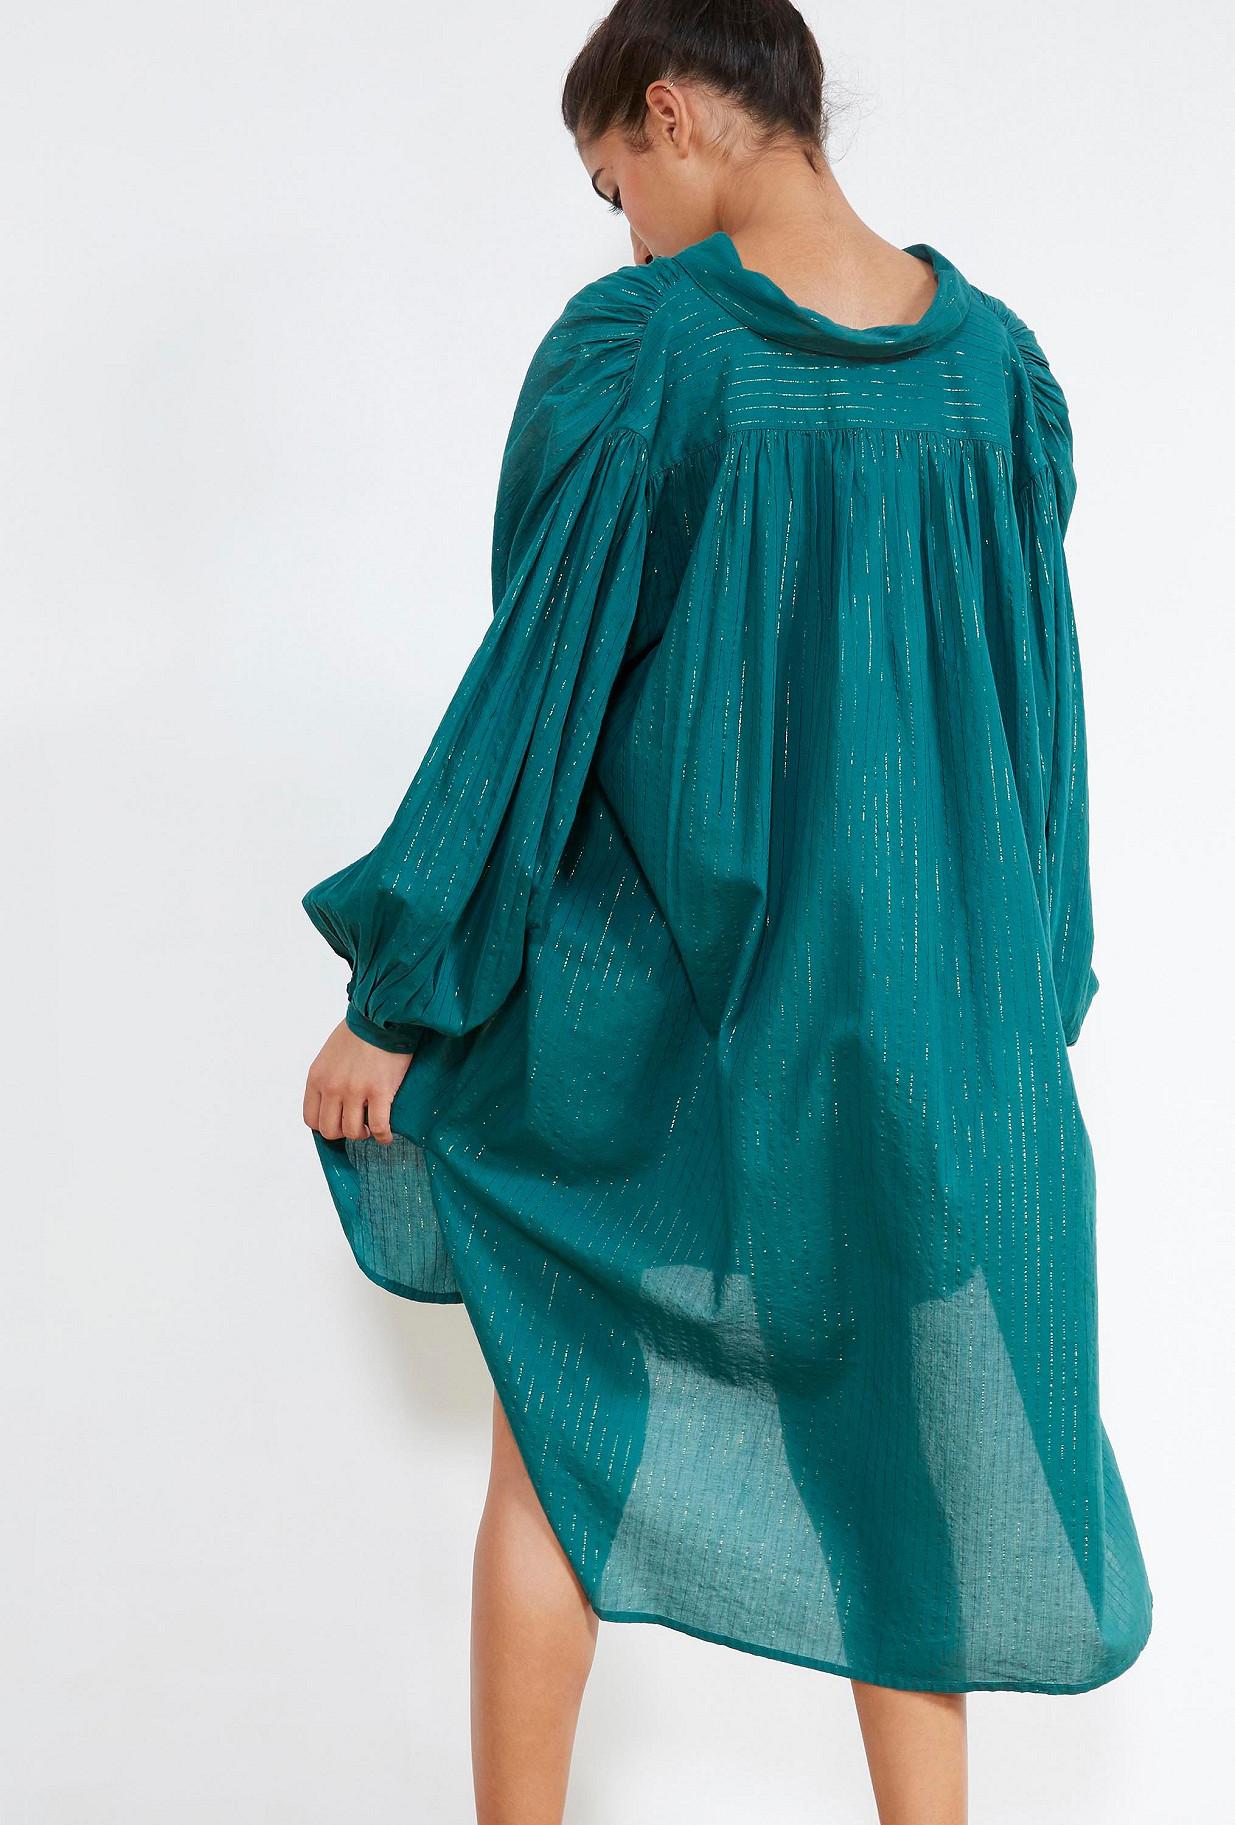 clothes store SHIRT  Seymour french designer fashion Paris